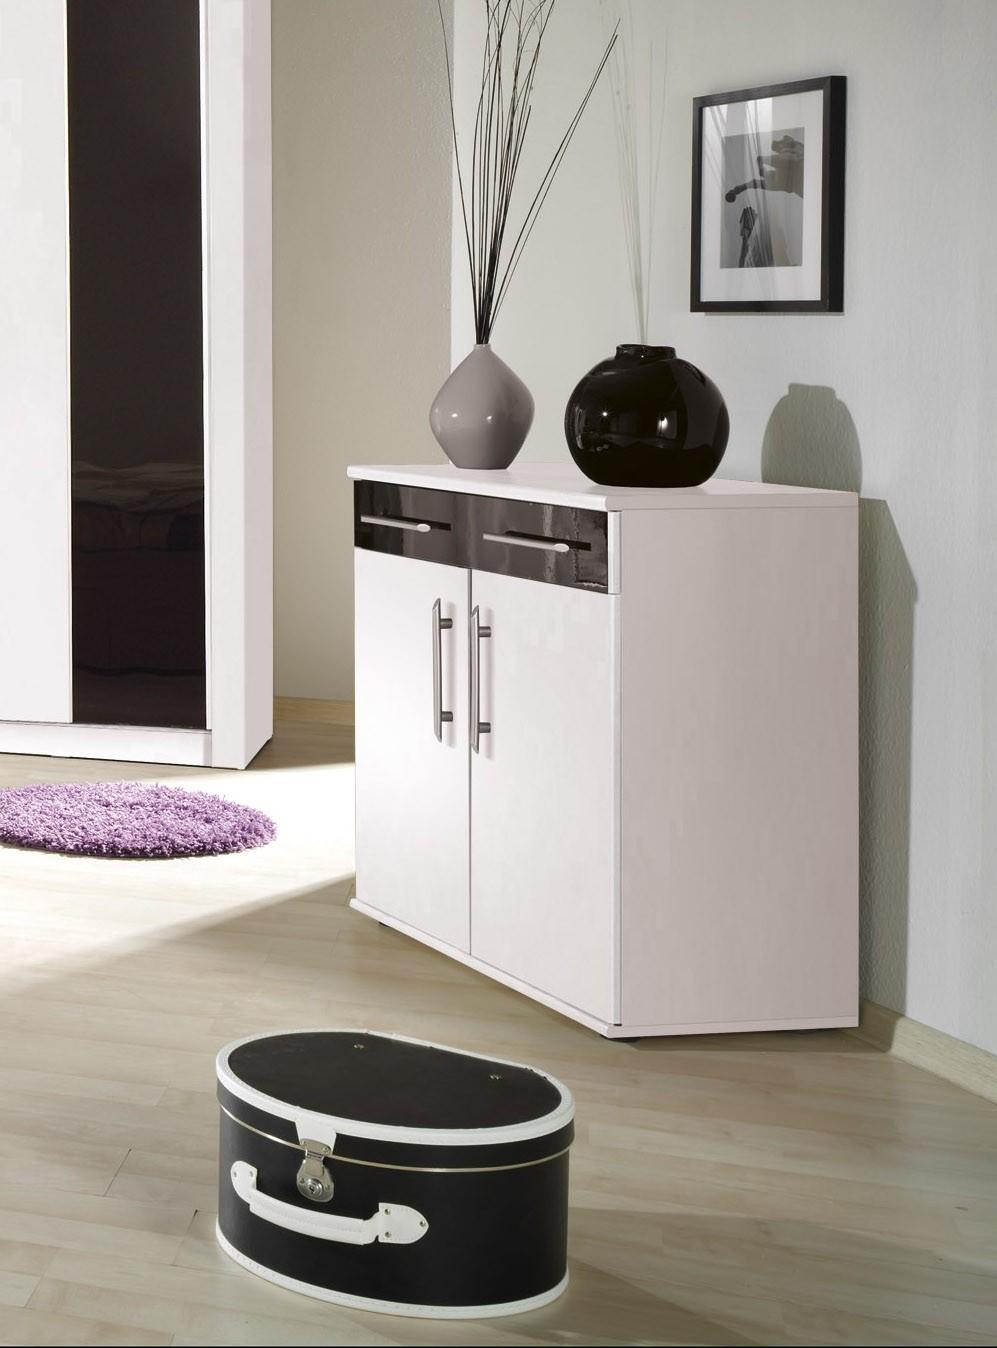 chambre coucher chambre coucher compl te dublin adulte design b. Black Bedroom Furniture Sets. Home Design Ideas